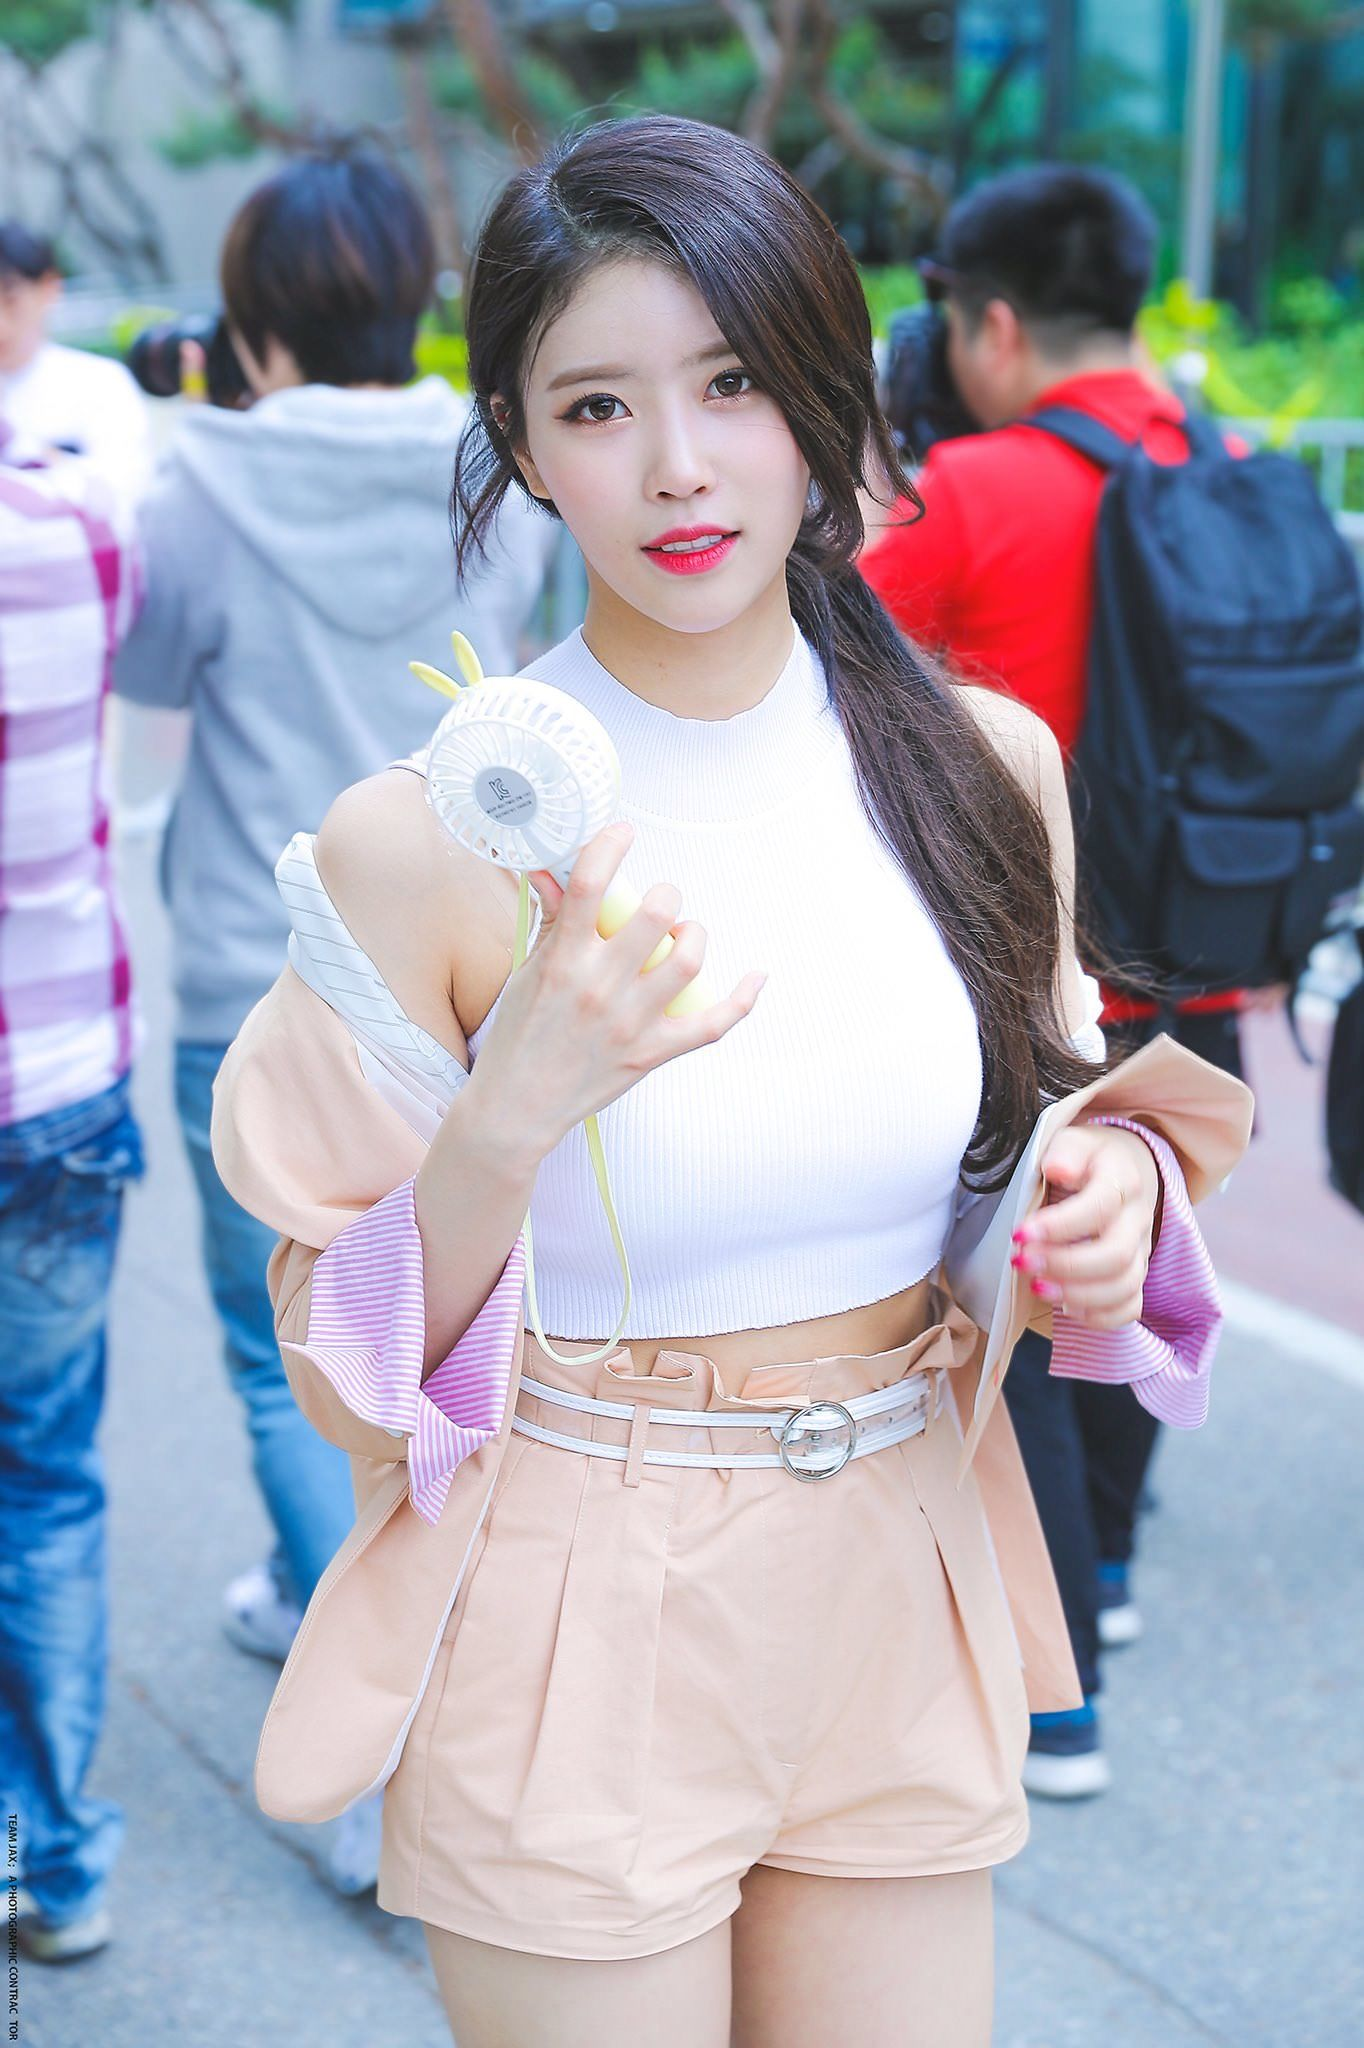 Lovelyz MiJoo | 여자 교복, 케이팝 패션, 여성